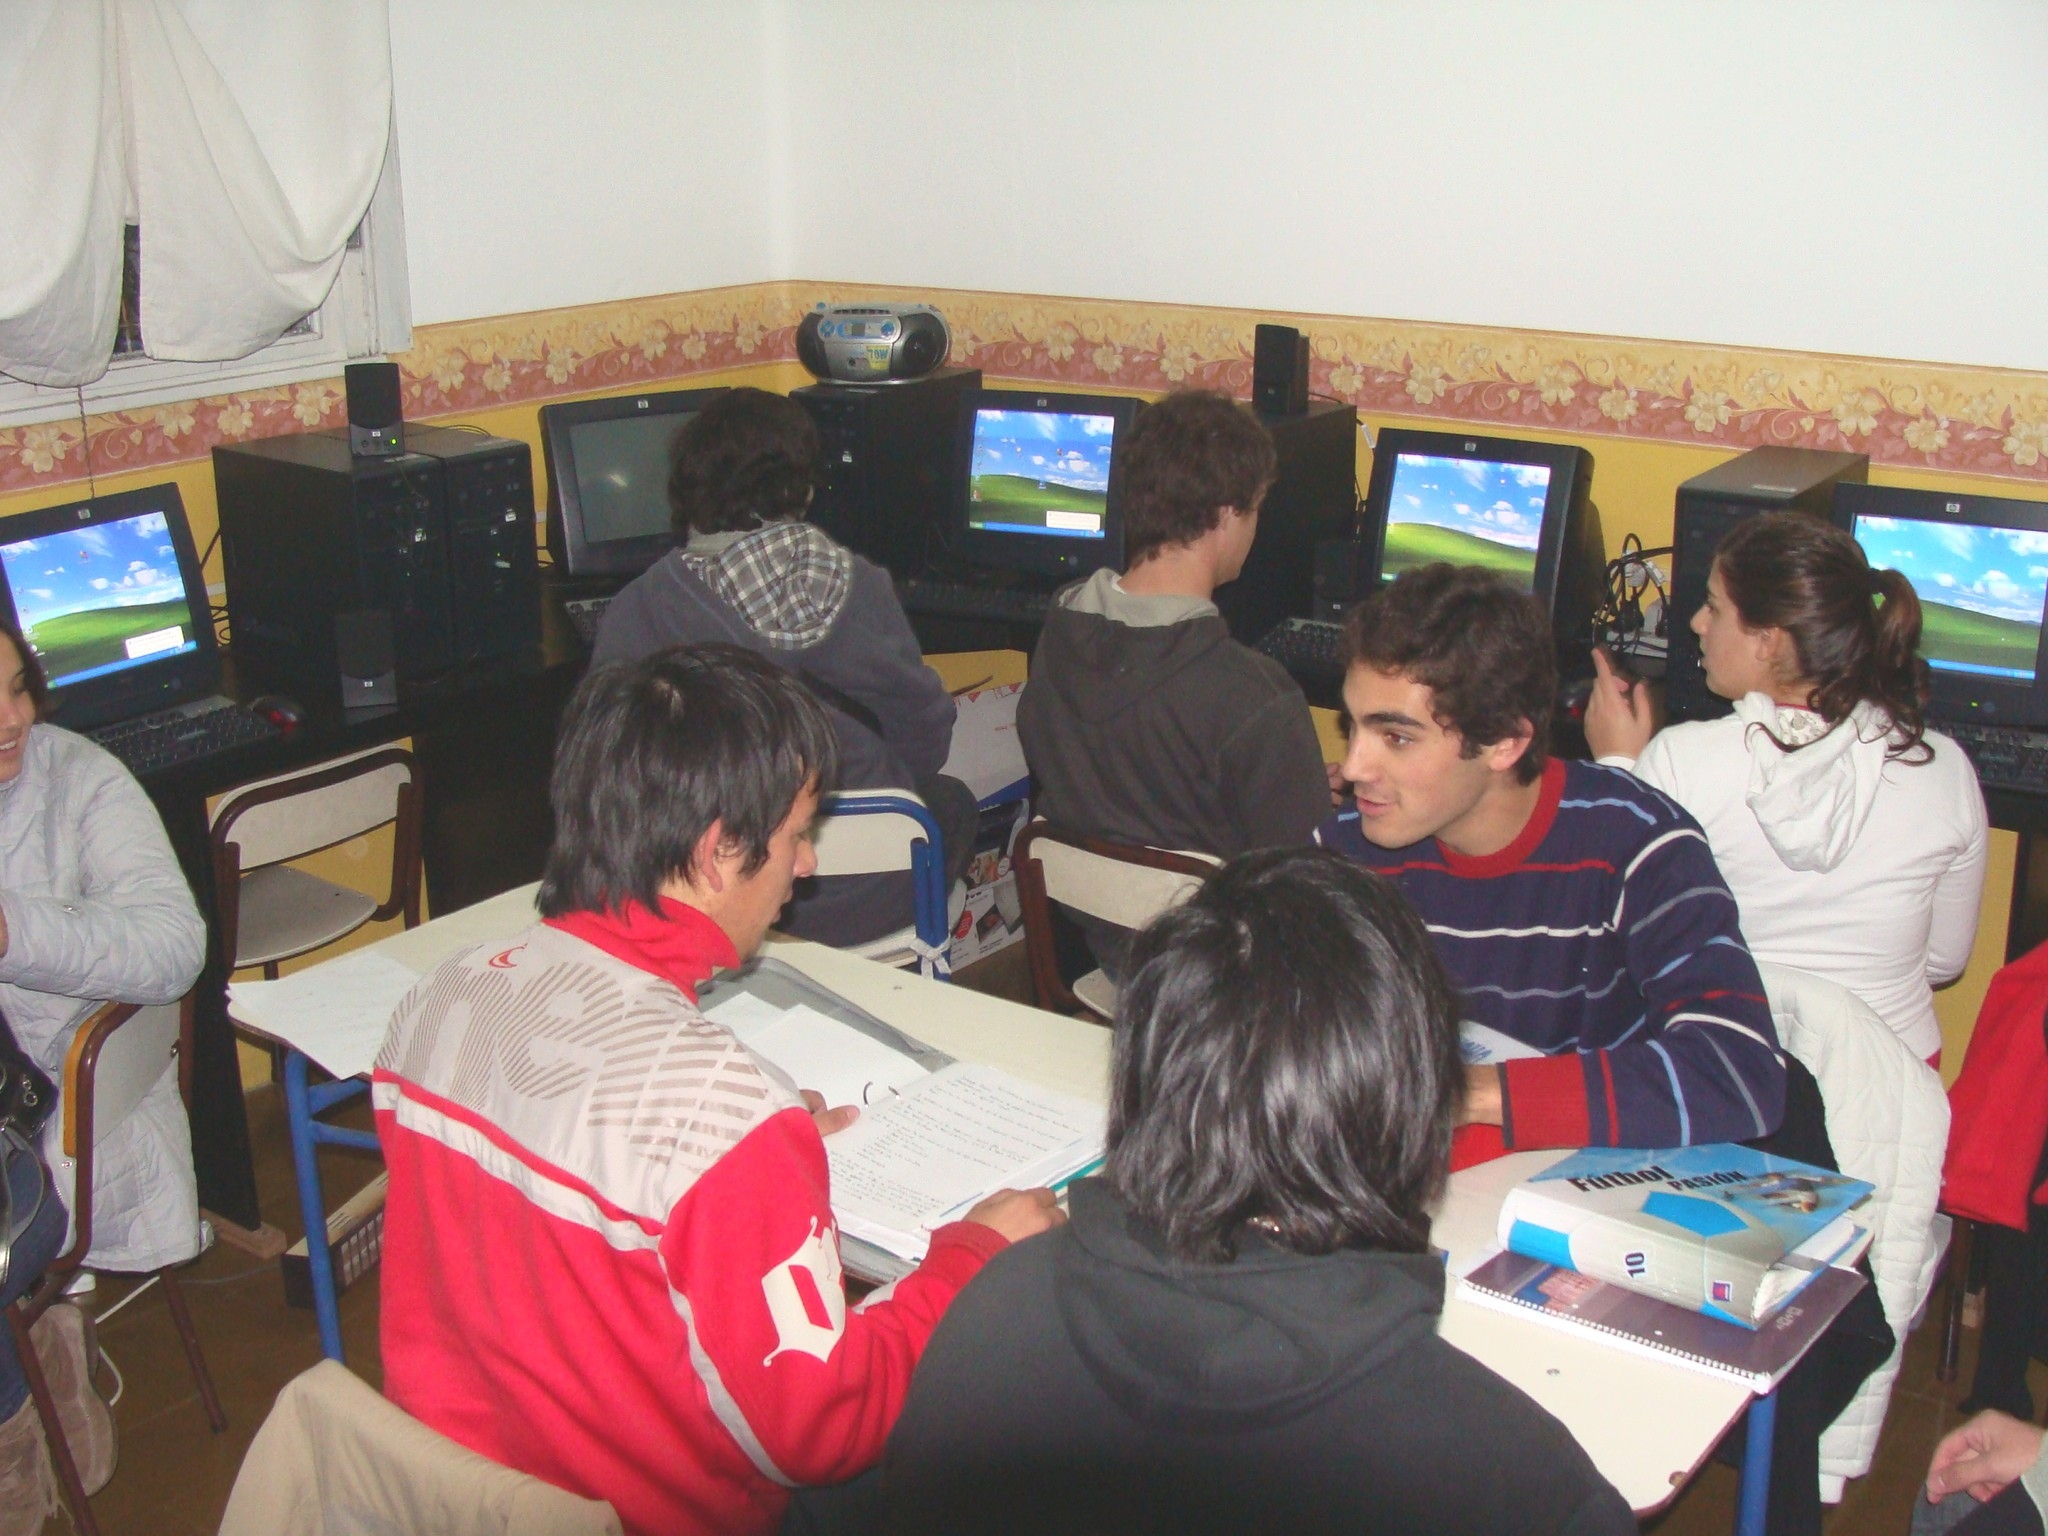 Instituto superior de formaci n docente y t cnica n 215 for Instituto formacion docente